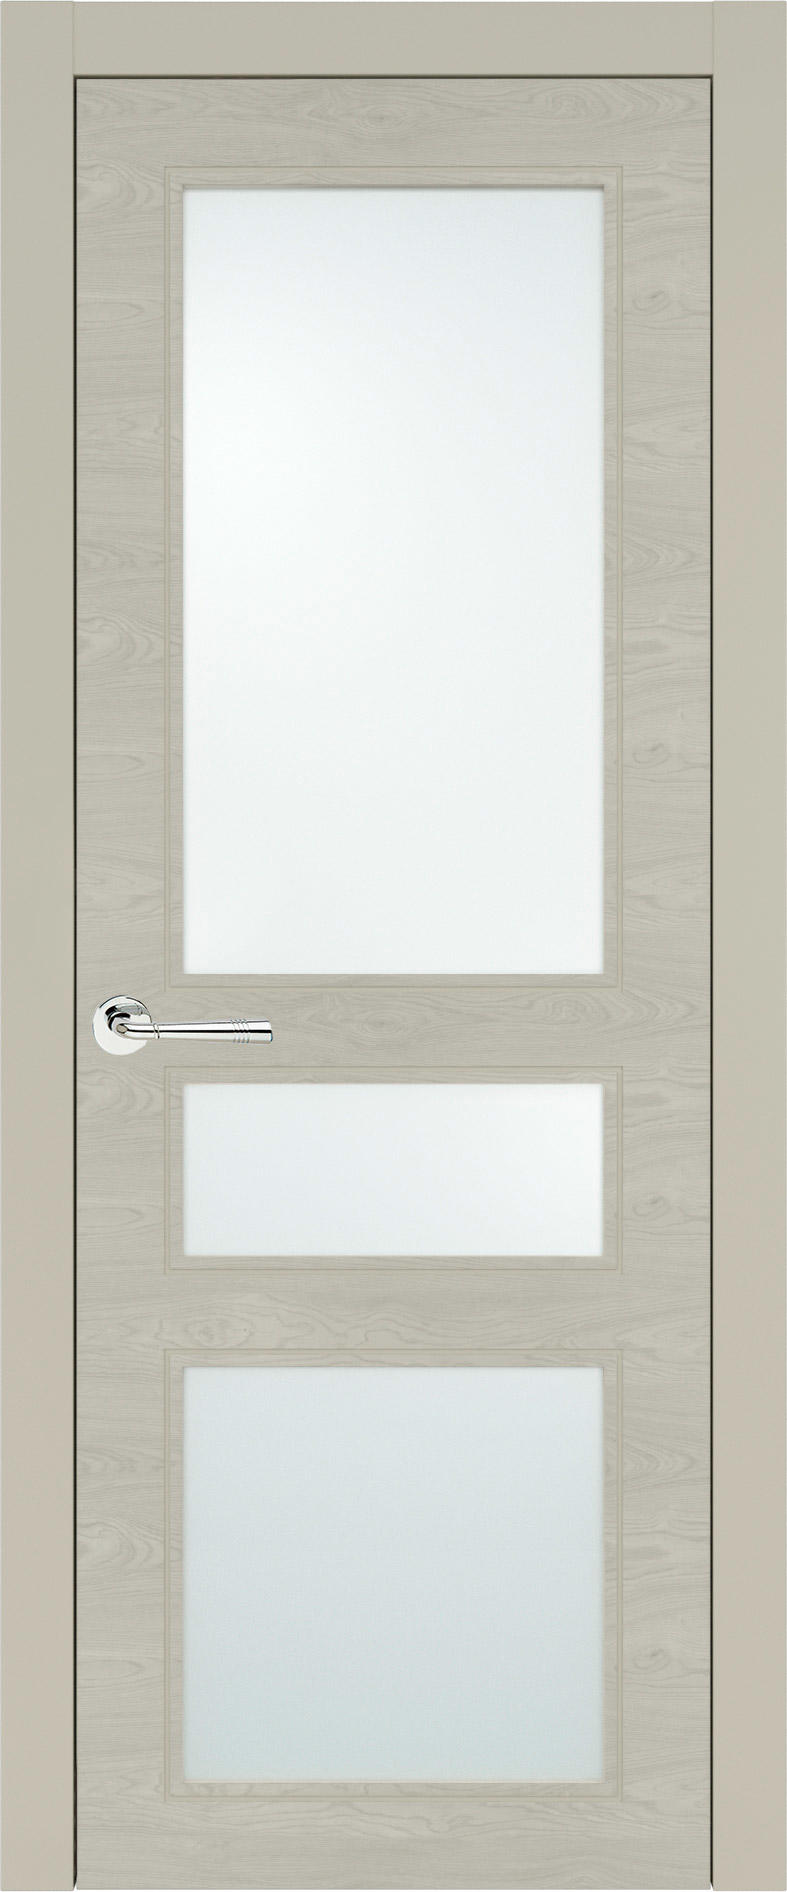 Imperia-R Neo Classic цвет - Серо-оливковая эмаль по шпону (RAL 7032) Со стеклом (ДО)